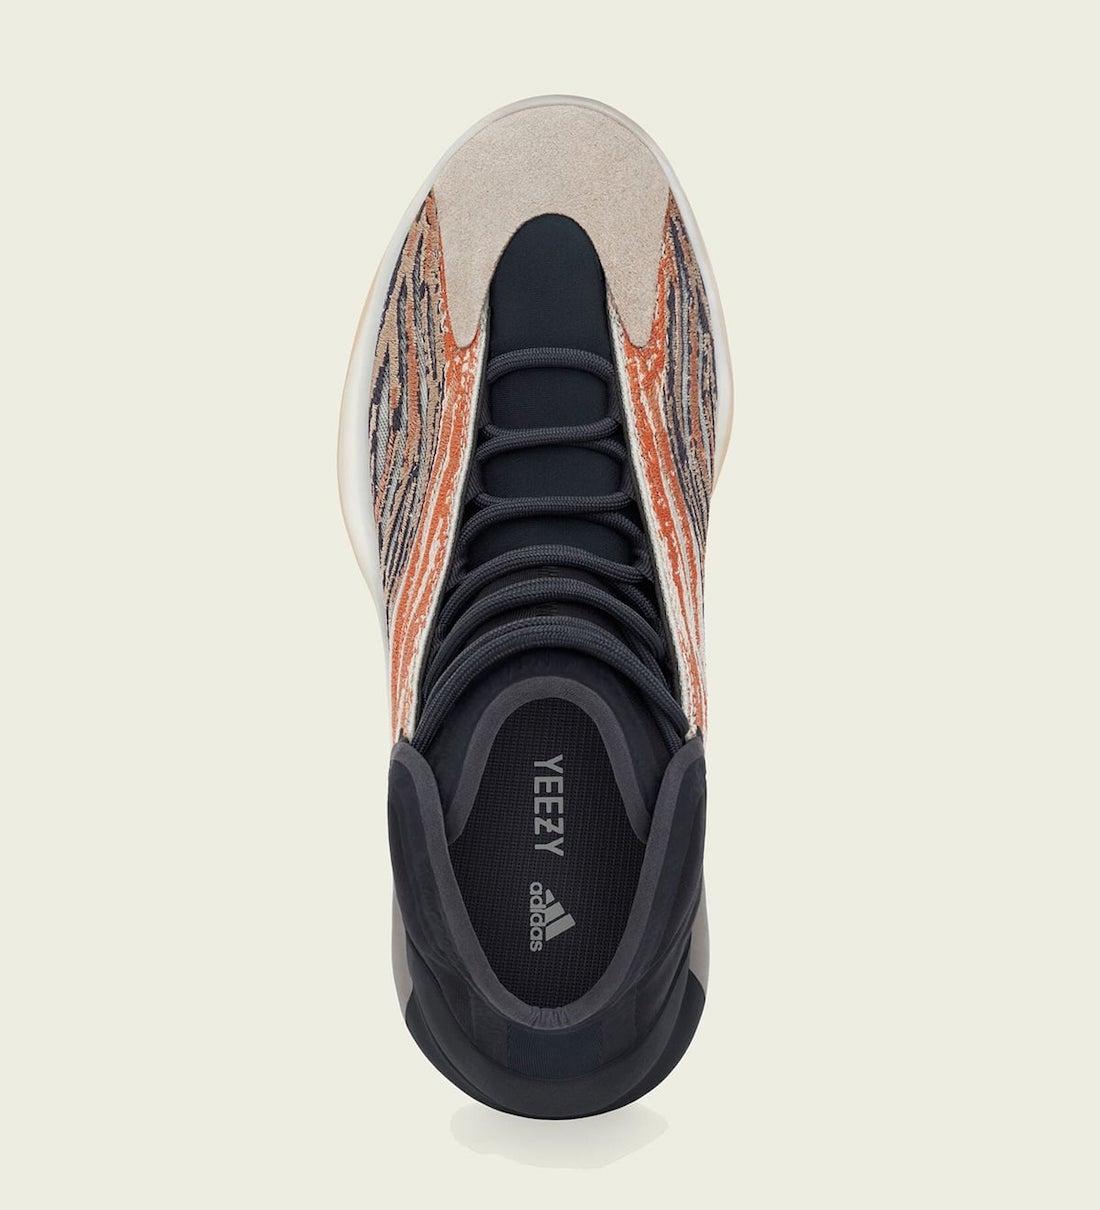 adidas-Yeezy-Quantum-Flash-Orange-GW5314-Release-Date-2